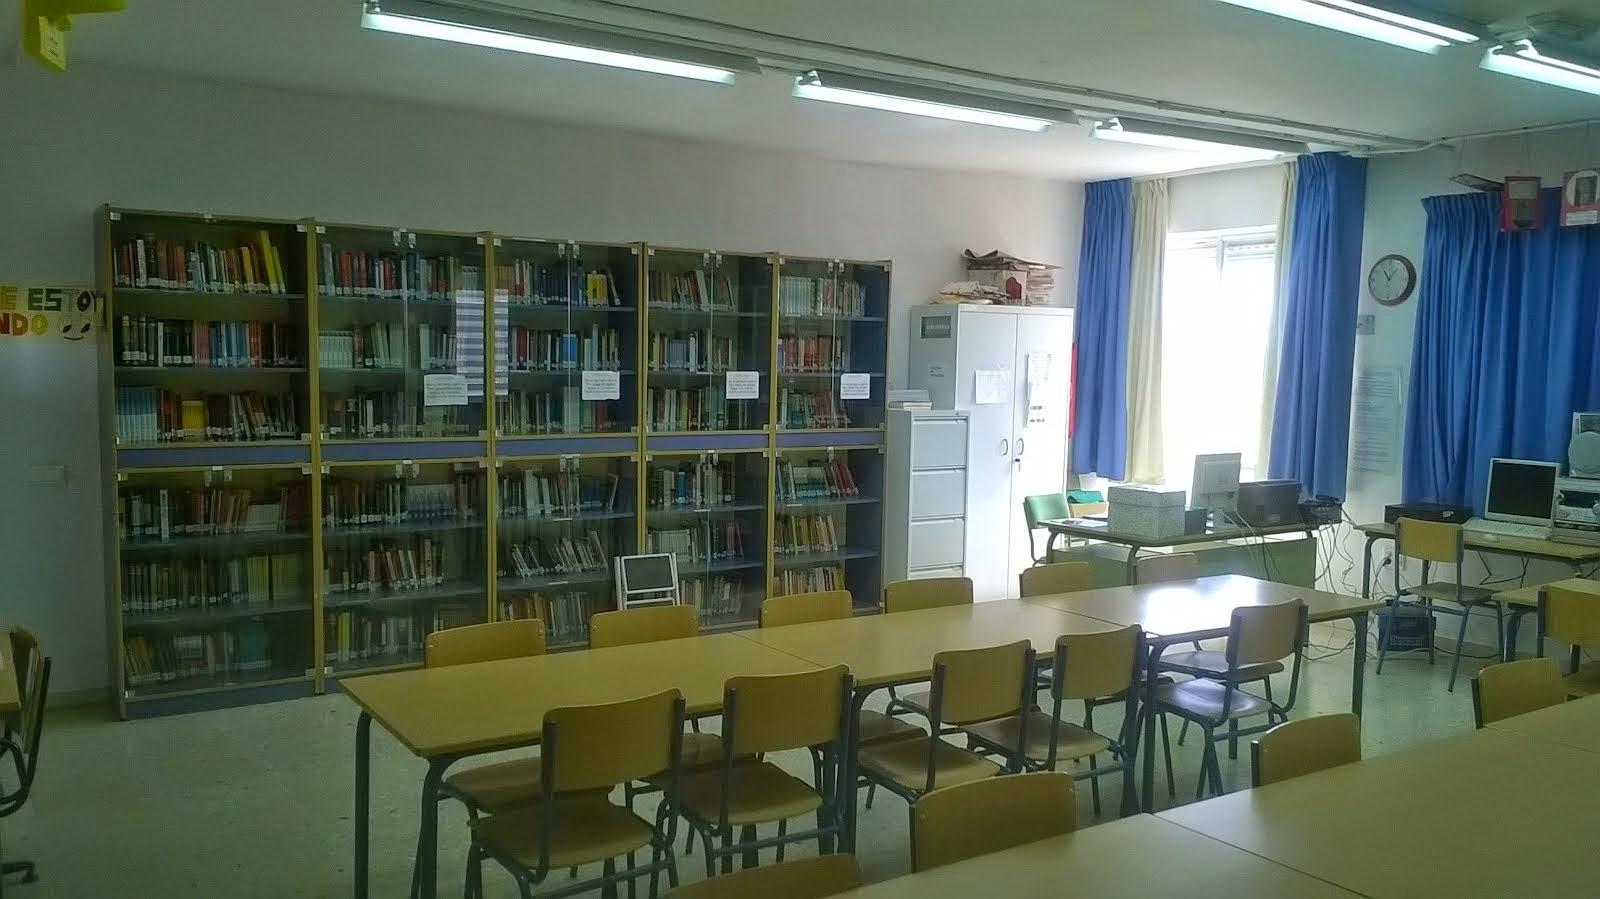 Biblioteca IES Mar Azul. Interior